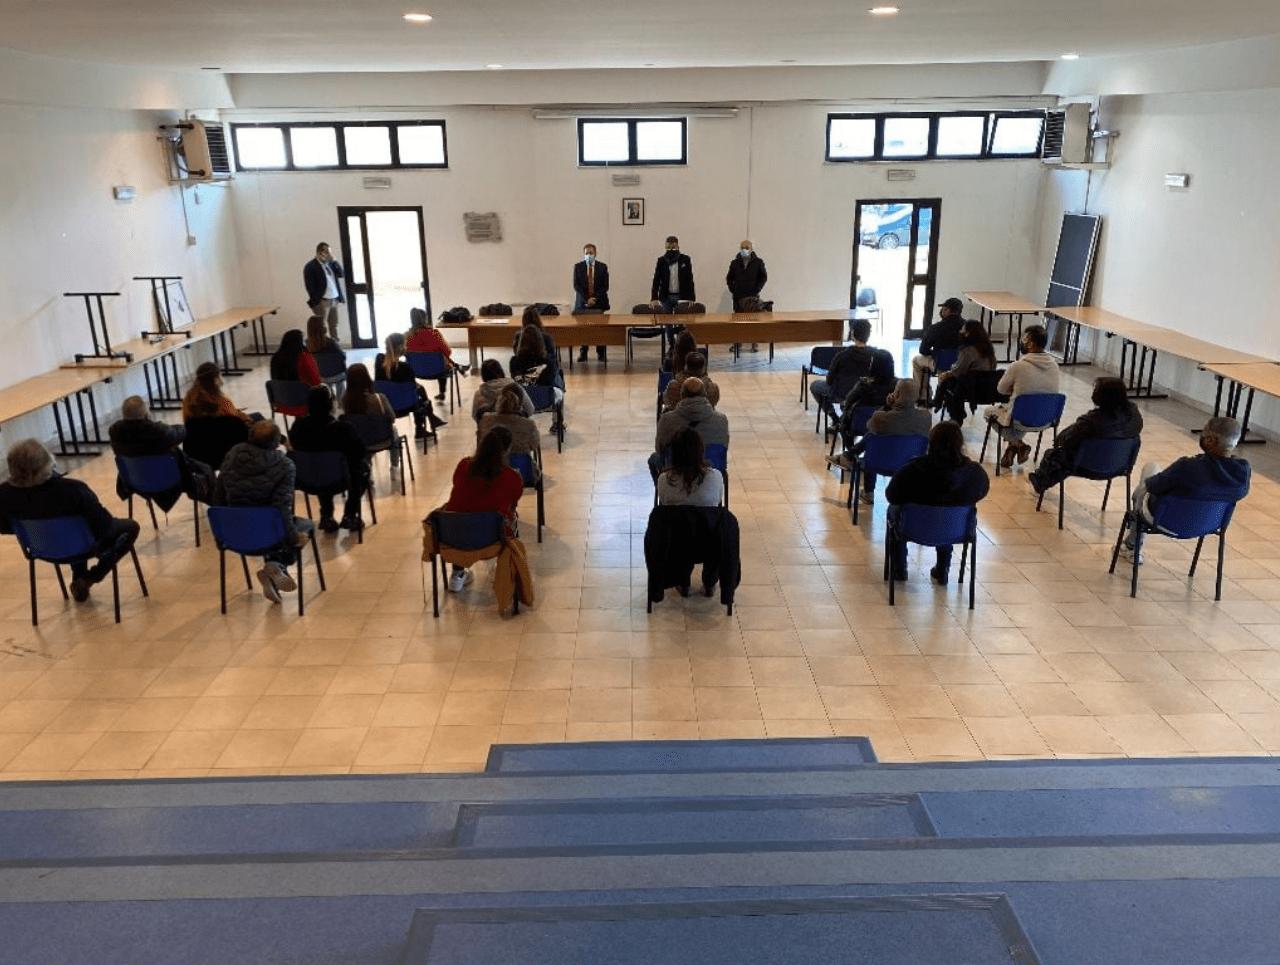 Sala Consiliare Torre Annunziata - Pagina Facebook Ufficiale Comune di Torre Annunziata